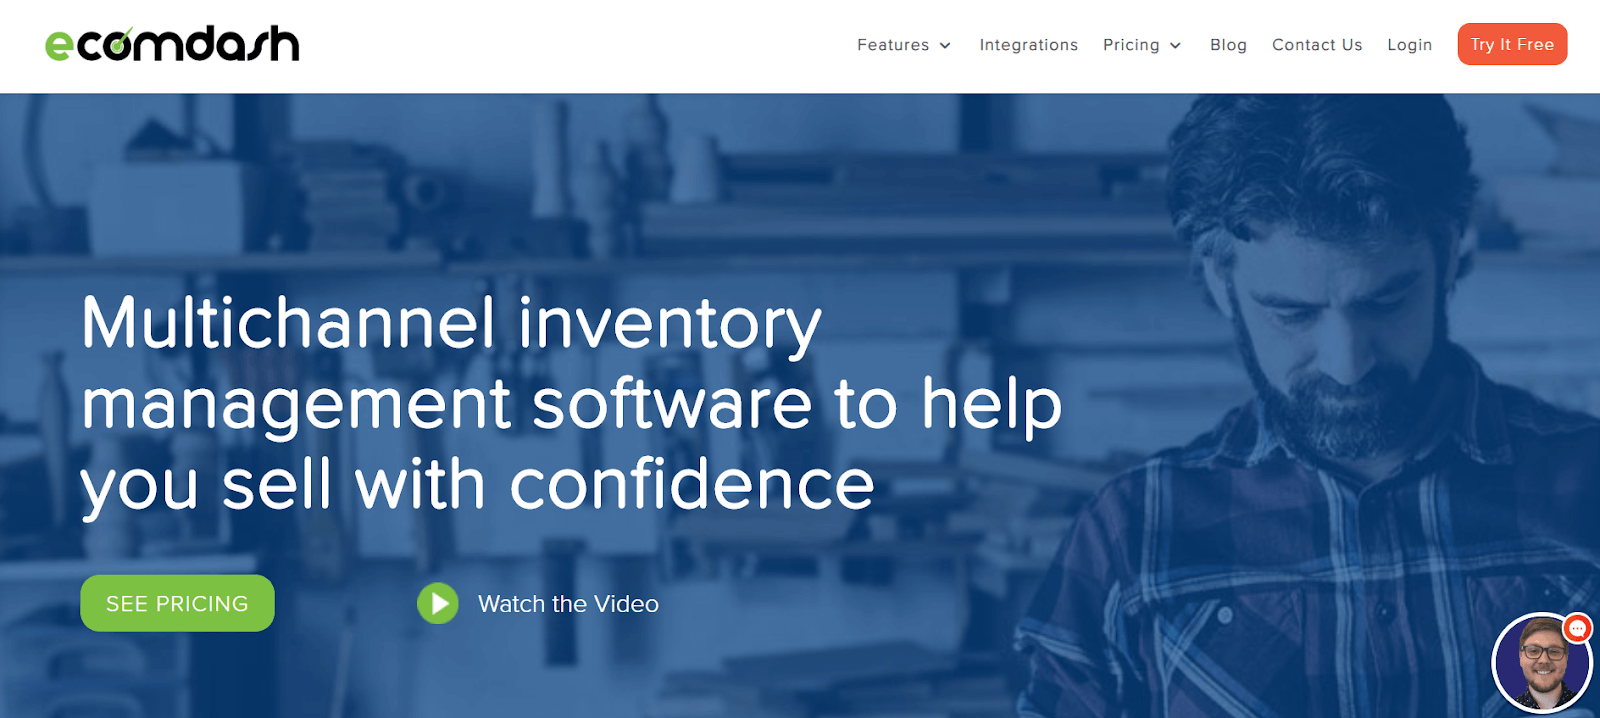 Ecomdash Best eCommerce tools